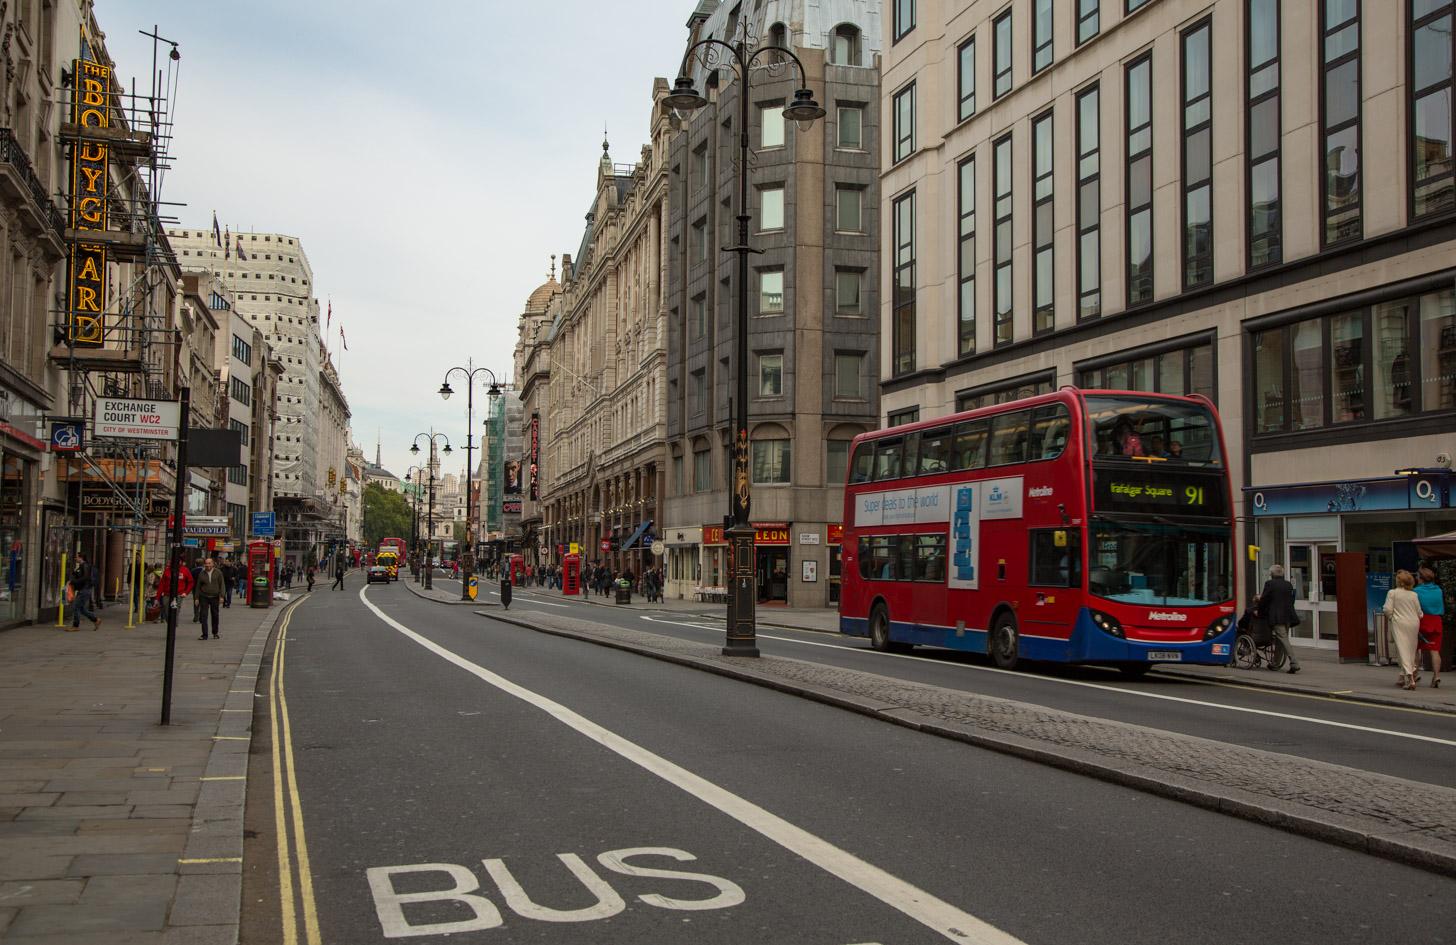 Londen straatbeeld